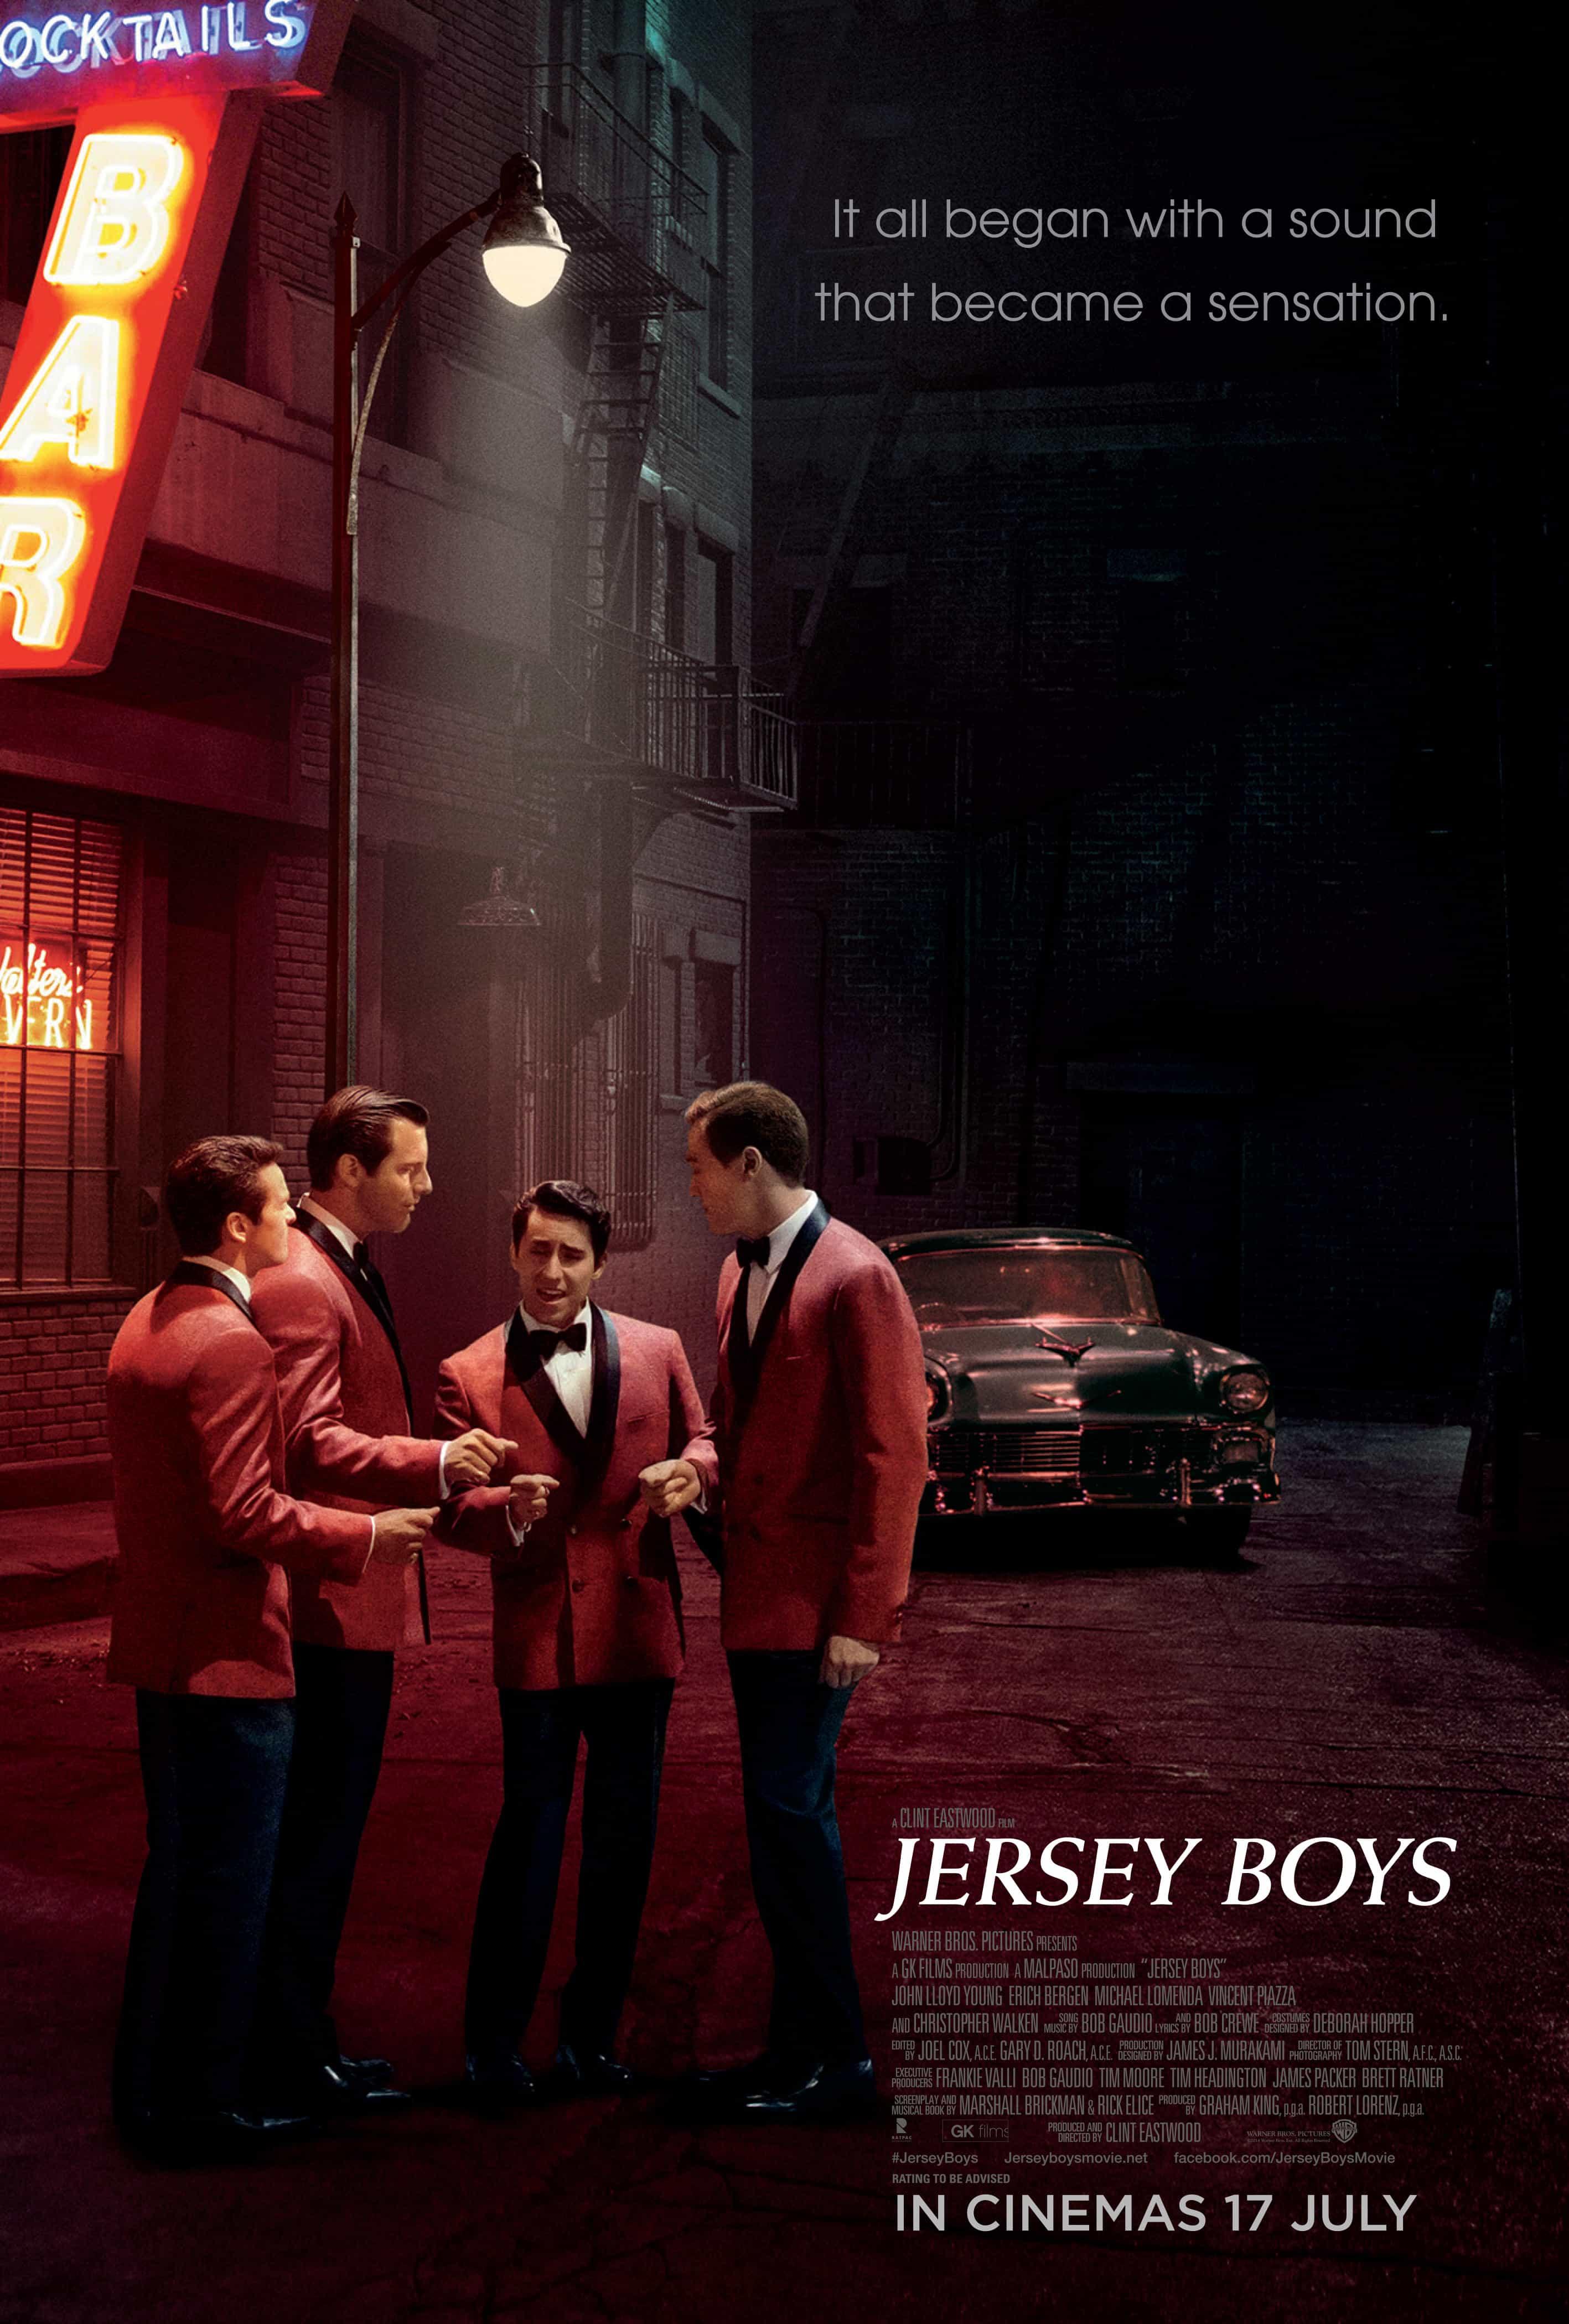 JERSEY BOYS – Contest